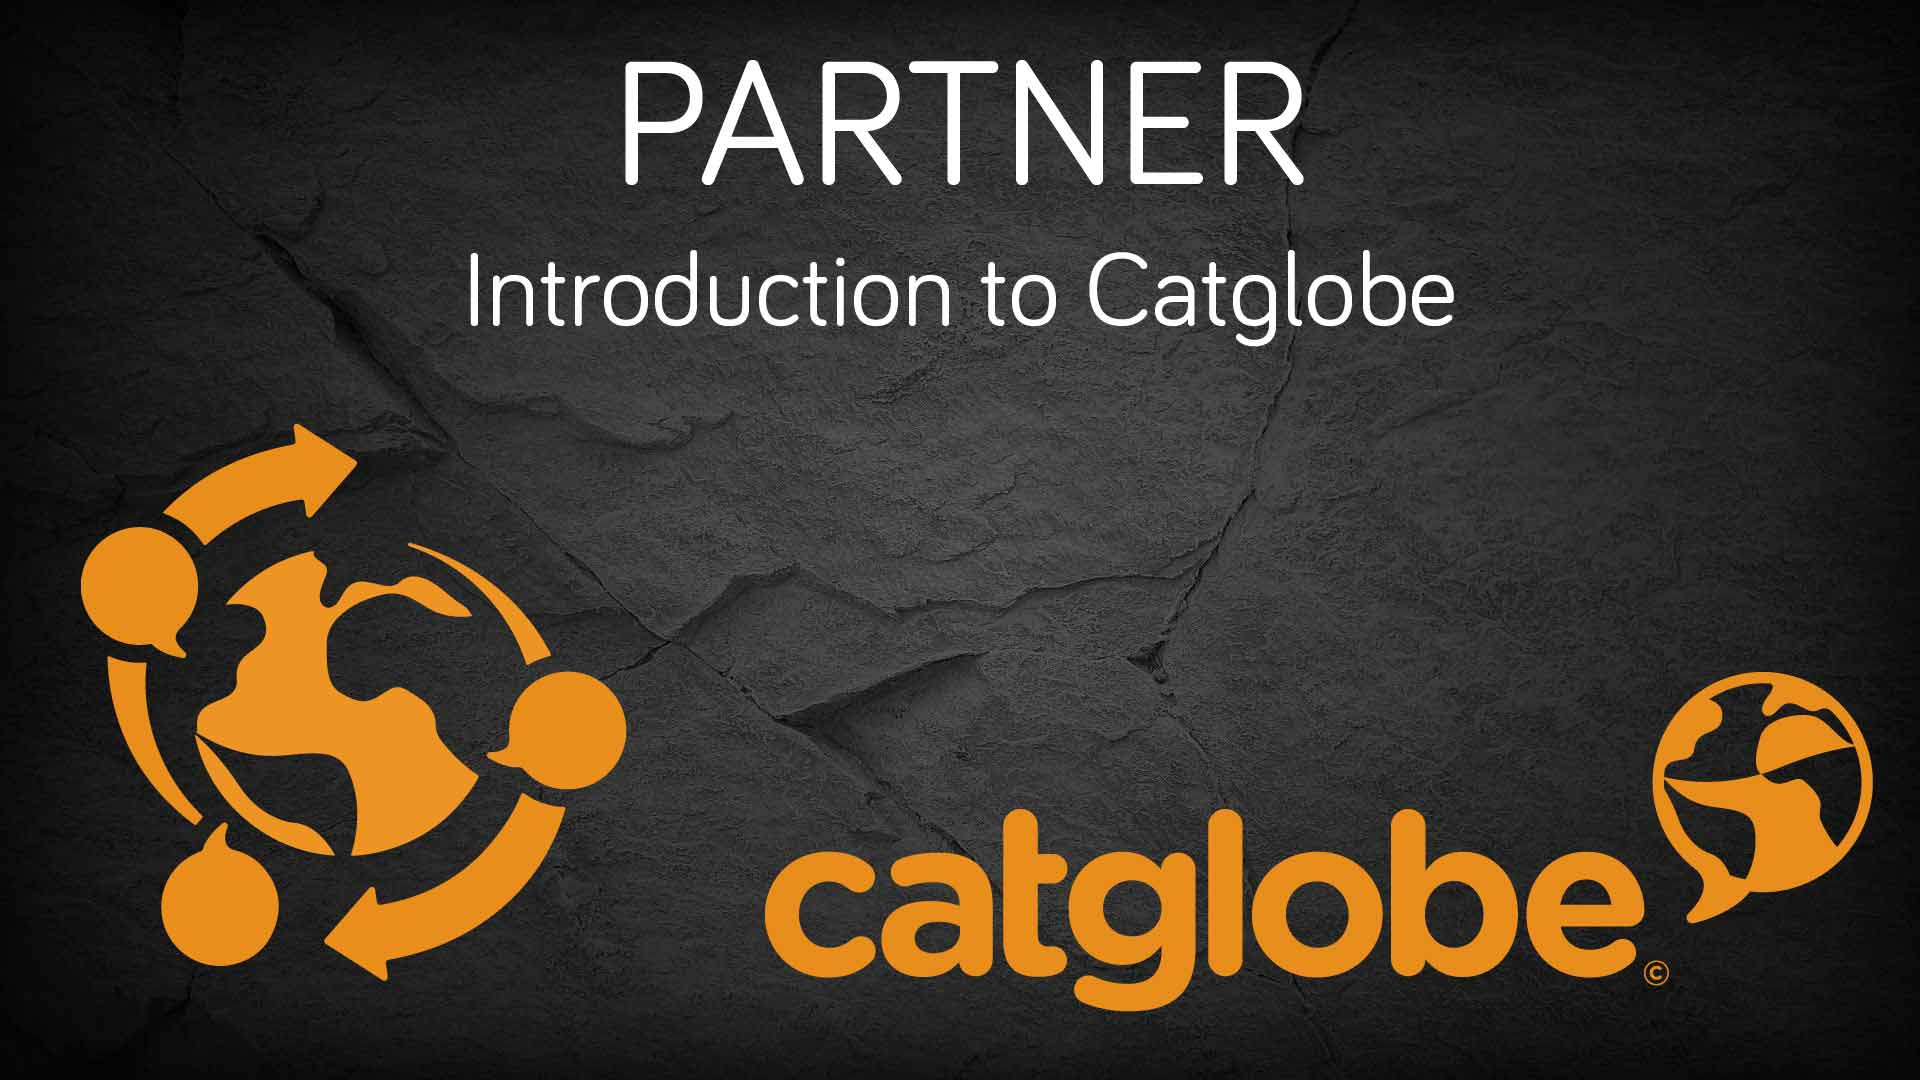 Catglobe partner introduction